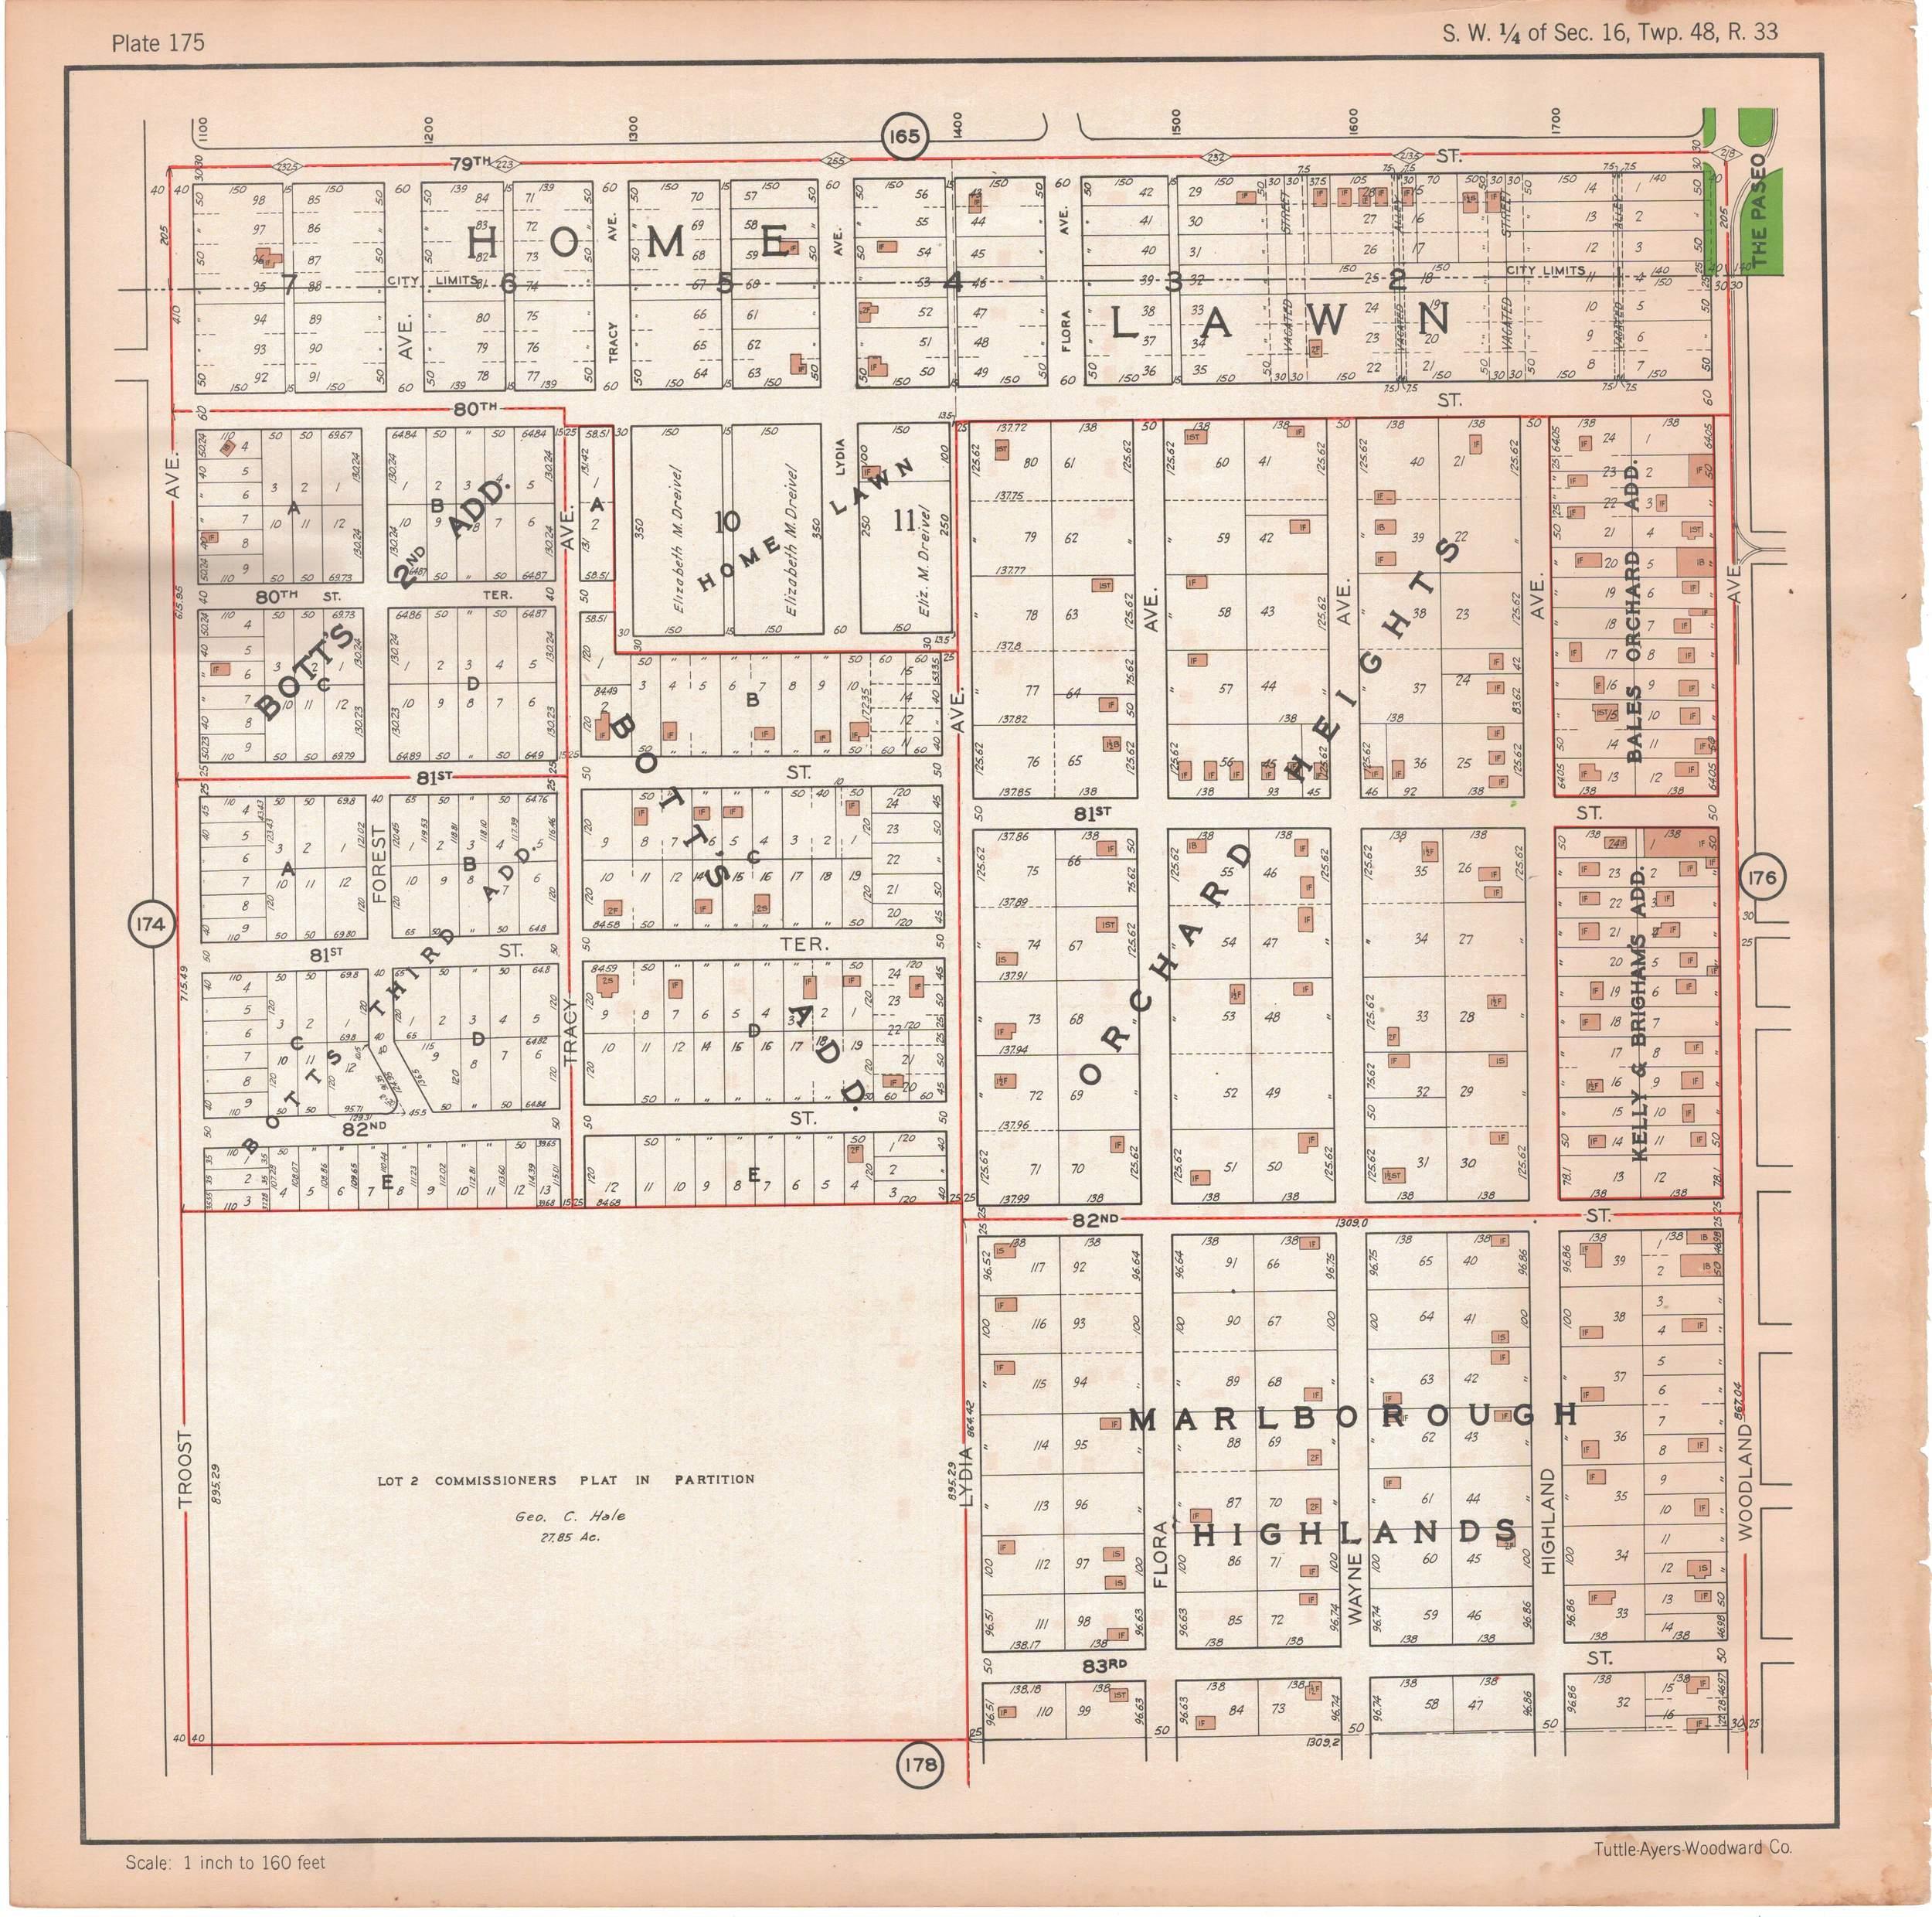 1925 TUTTLE_AYERS_Plate_175.JPG